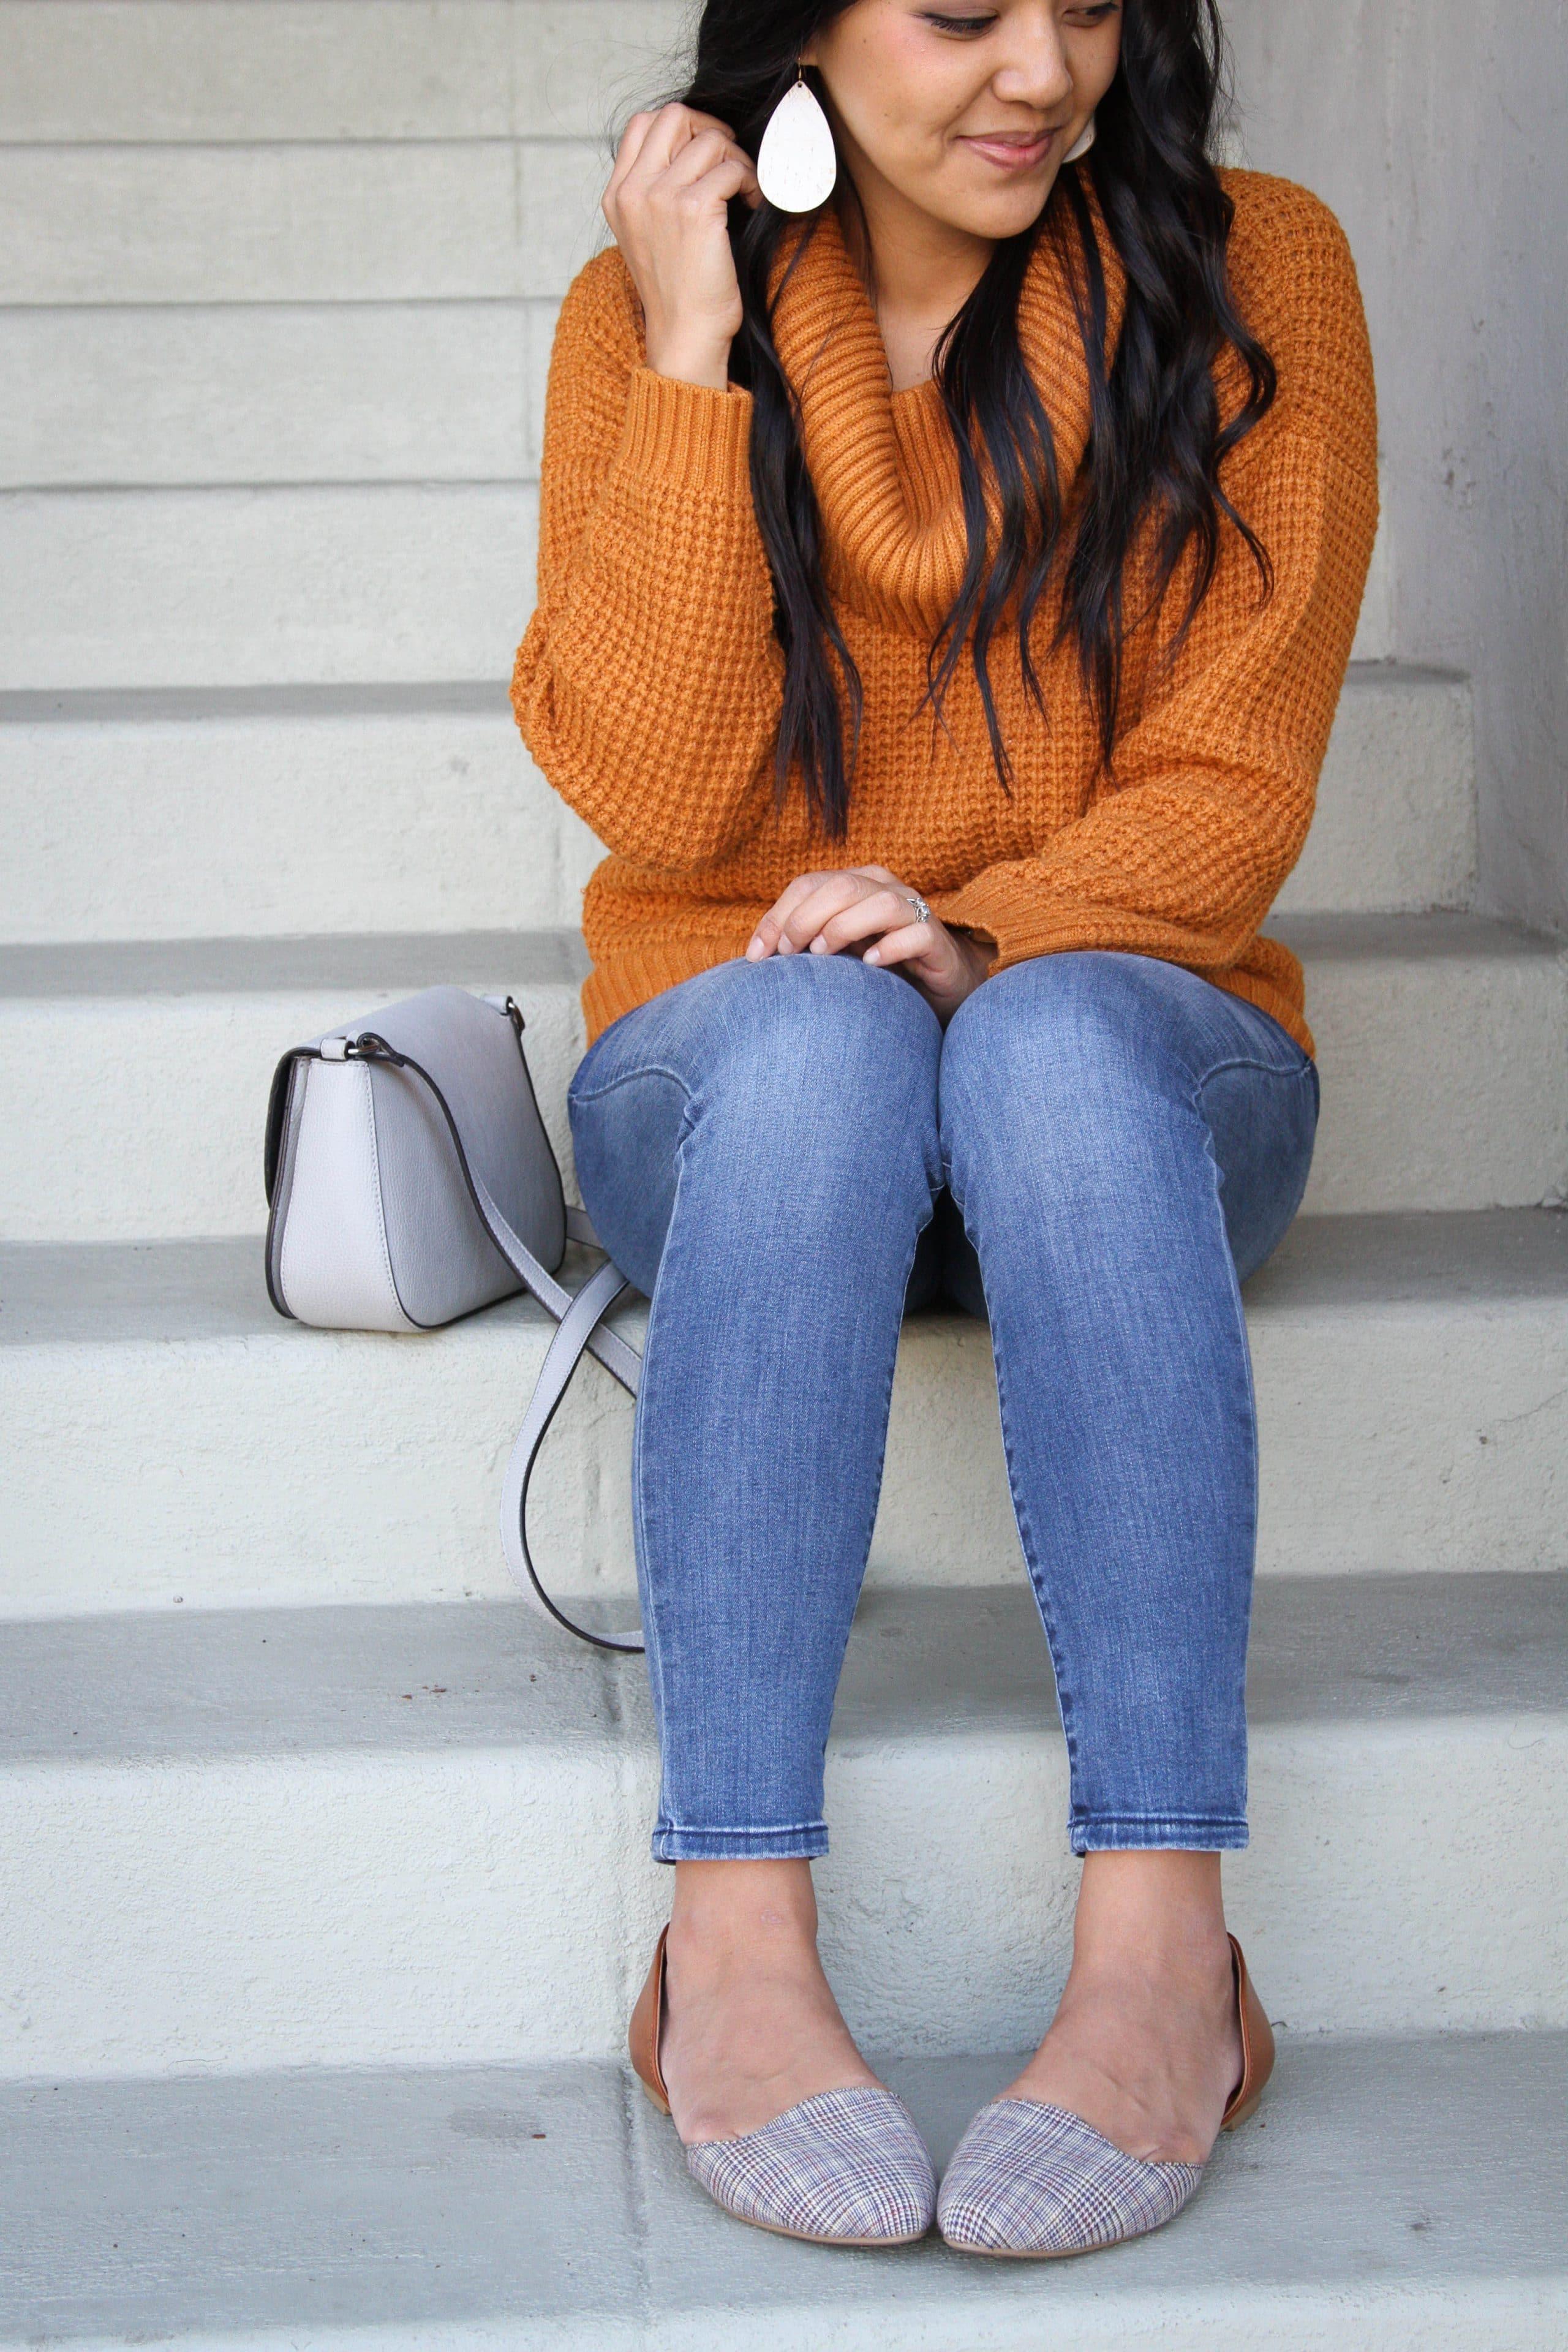 Light jeans + Printed Flats + Fall Sweater + Gray bag